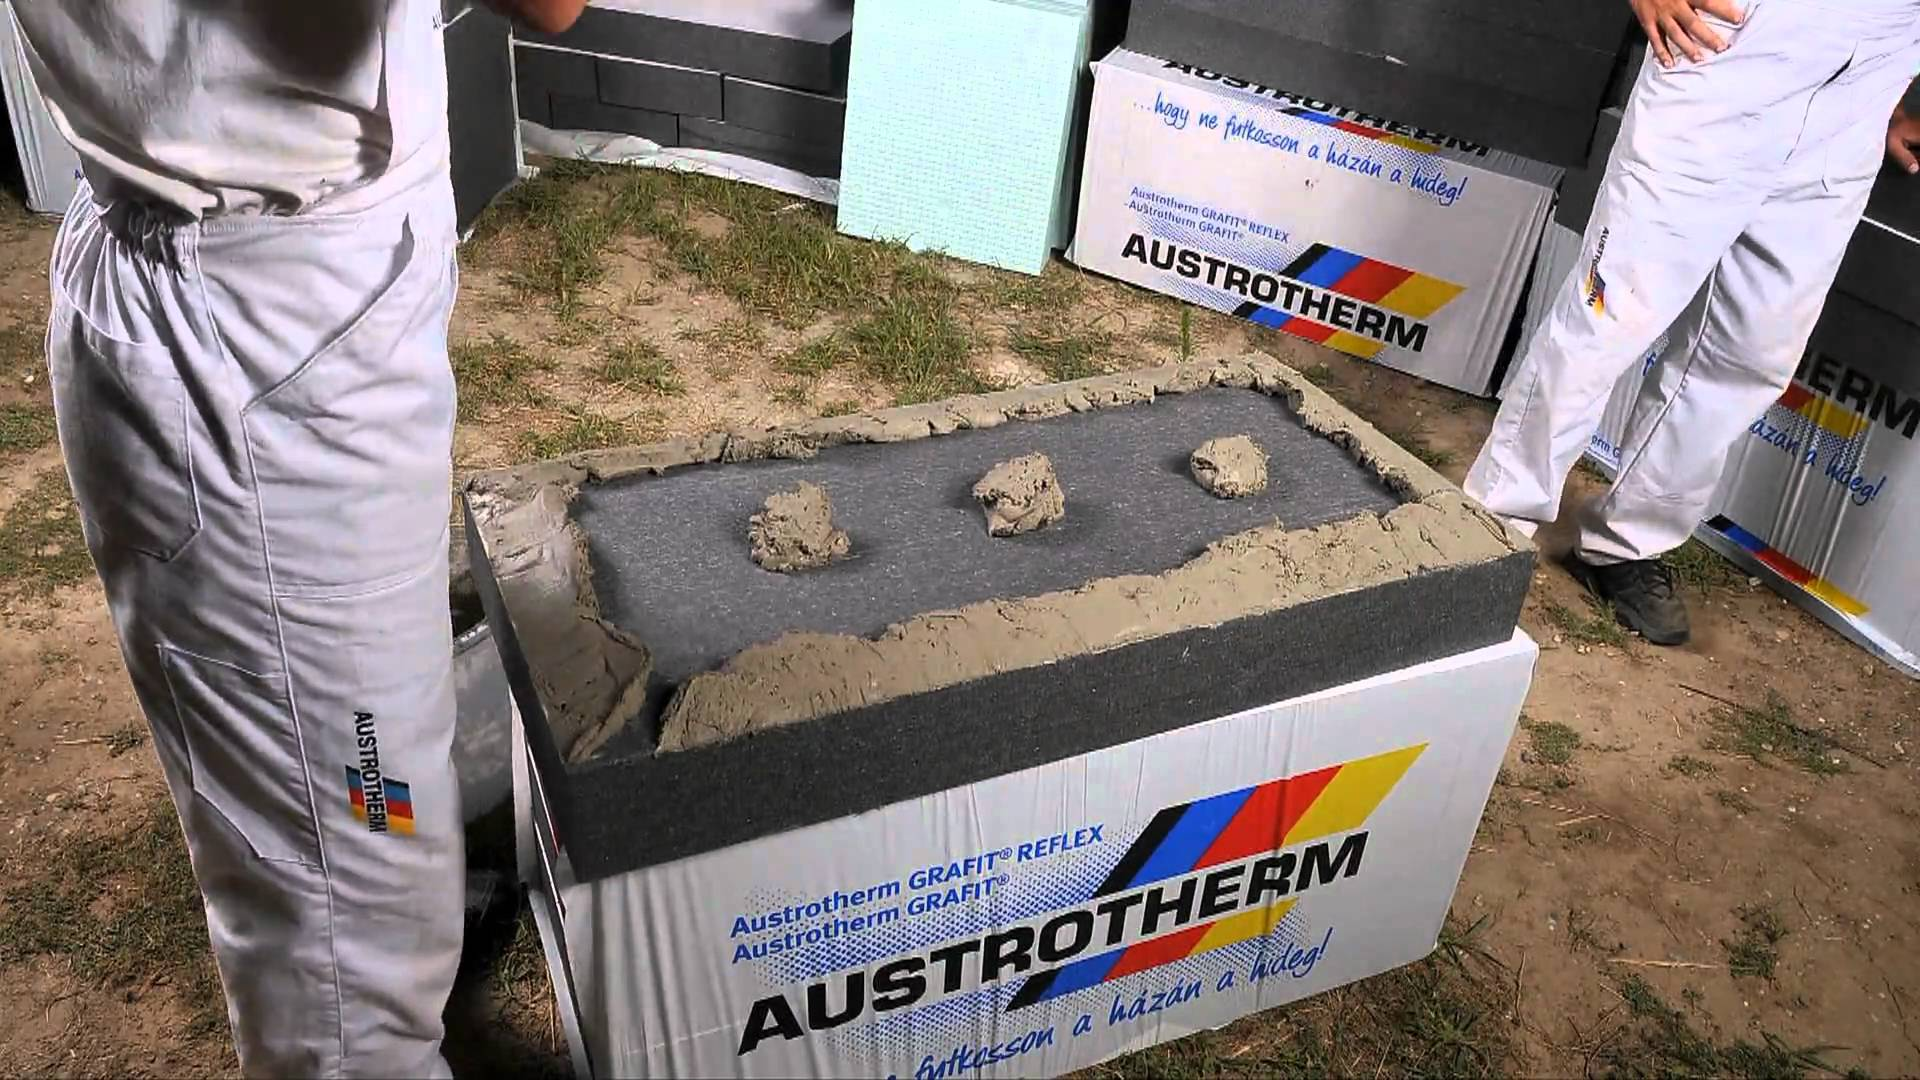 Austrotherm - Grafit Reflex